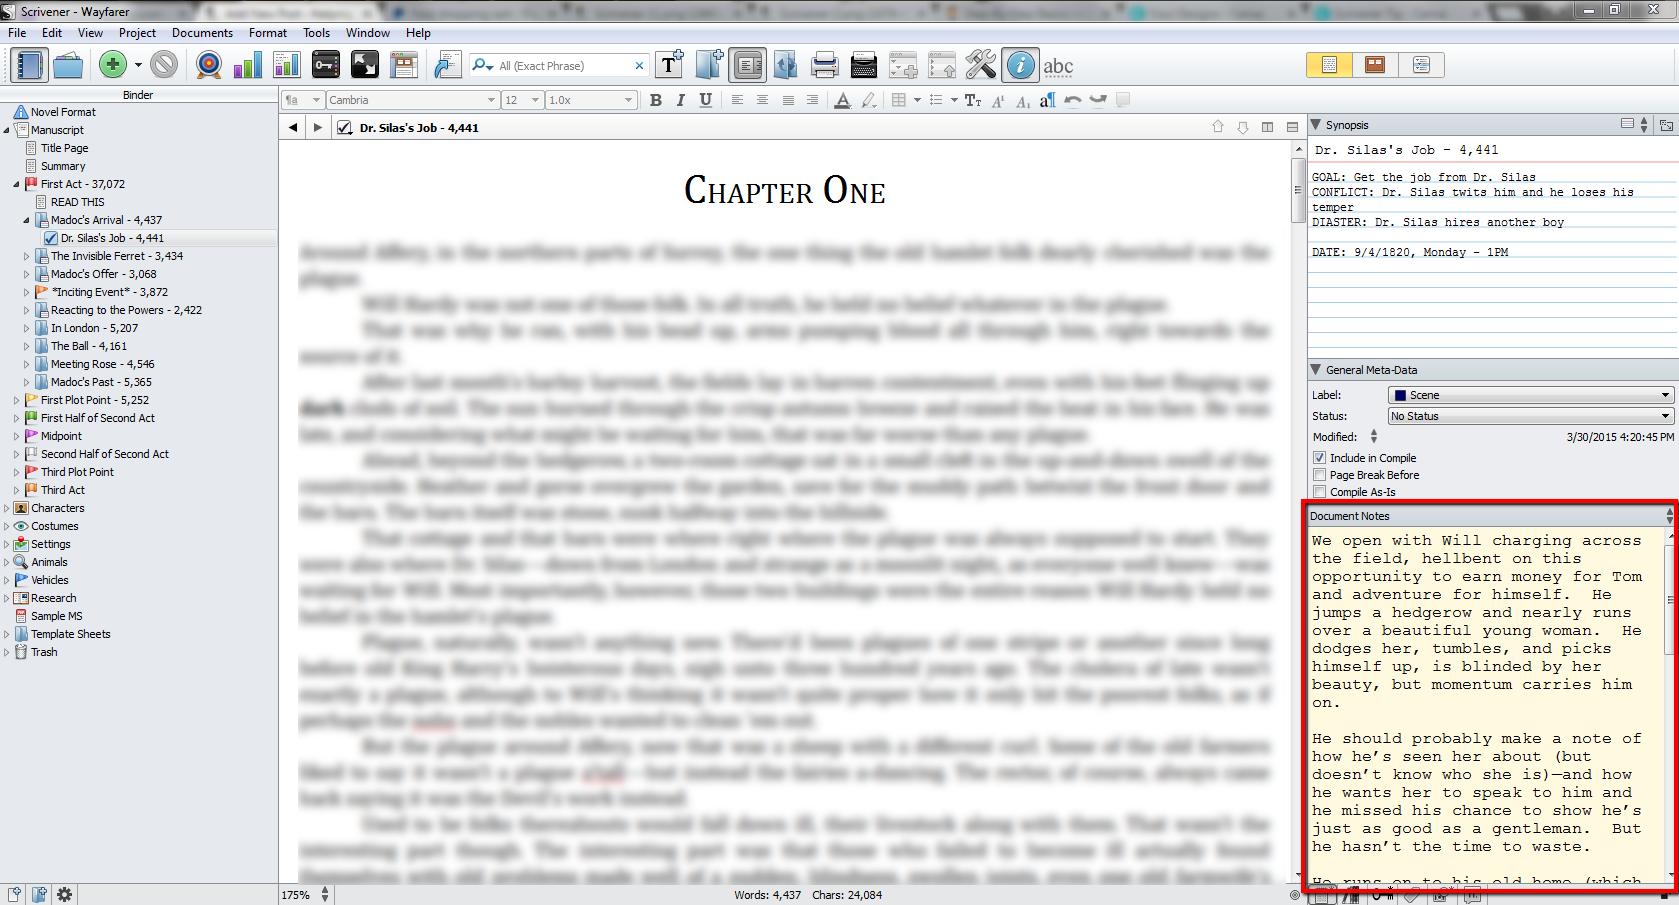 Scrivener_Wayfarer_Document_Notes